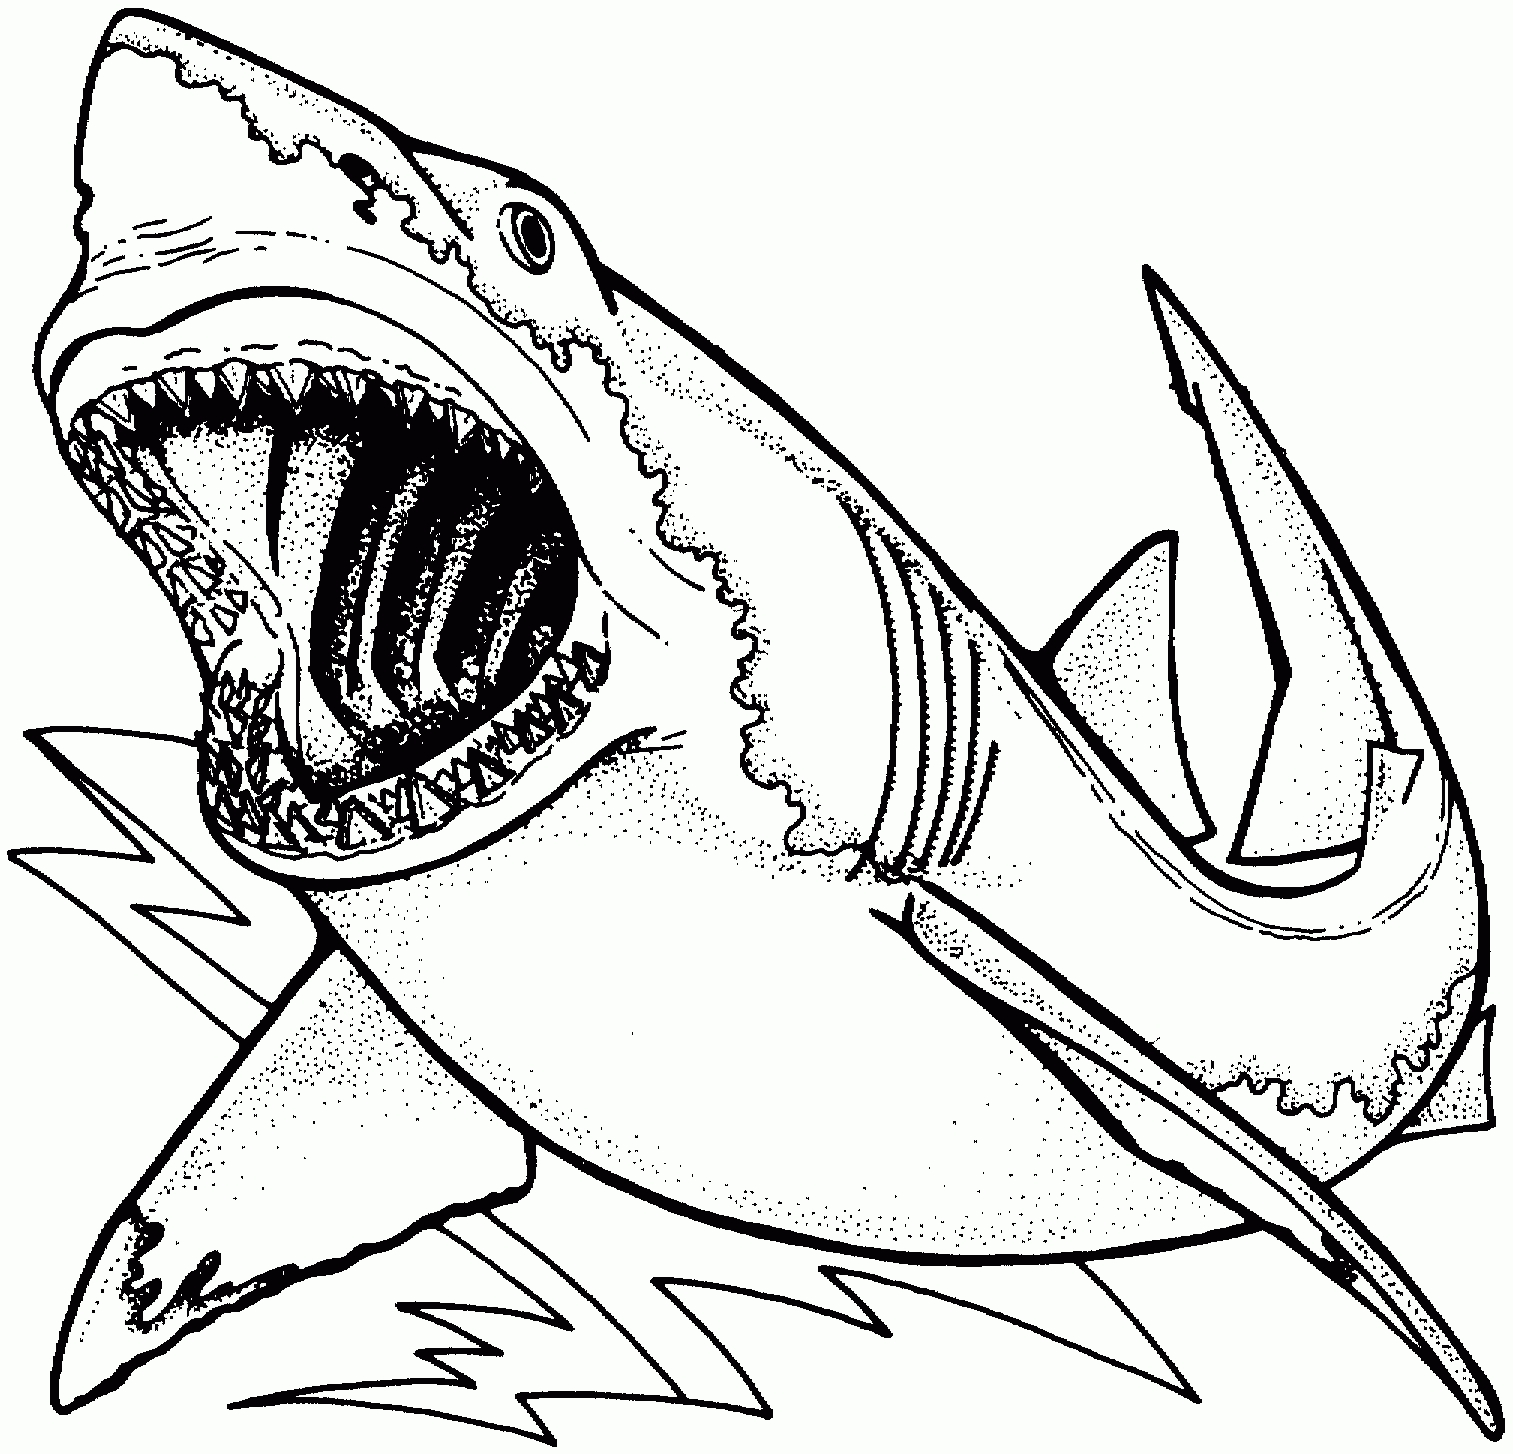 Cute Shark Drawing at GetDrawings.com | Free for personal use Cute ...